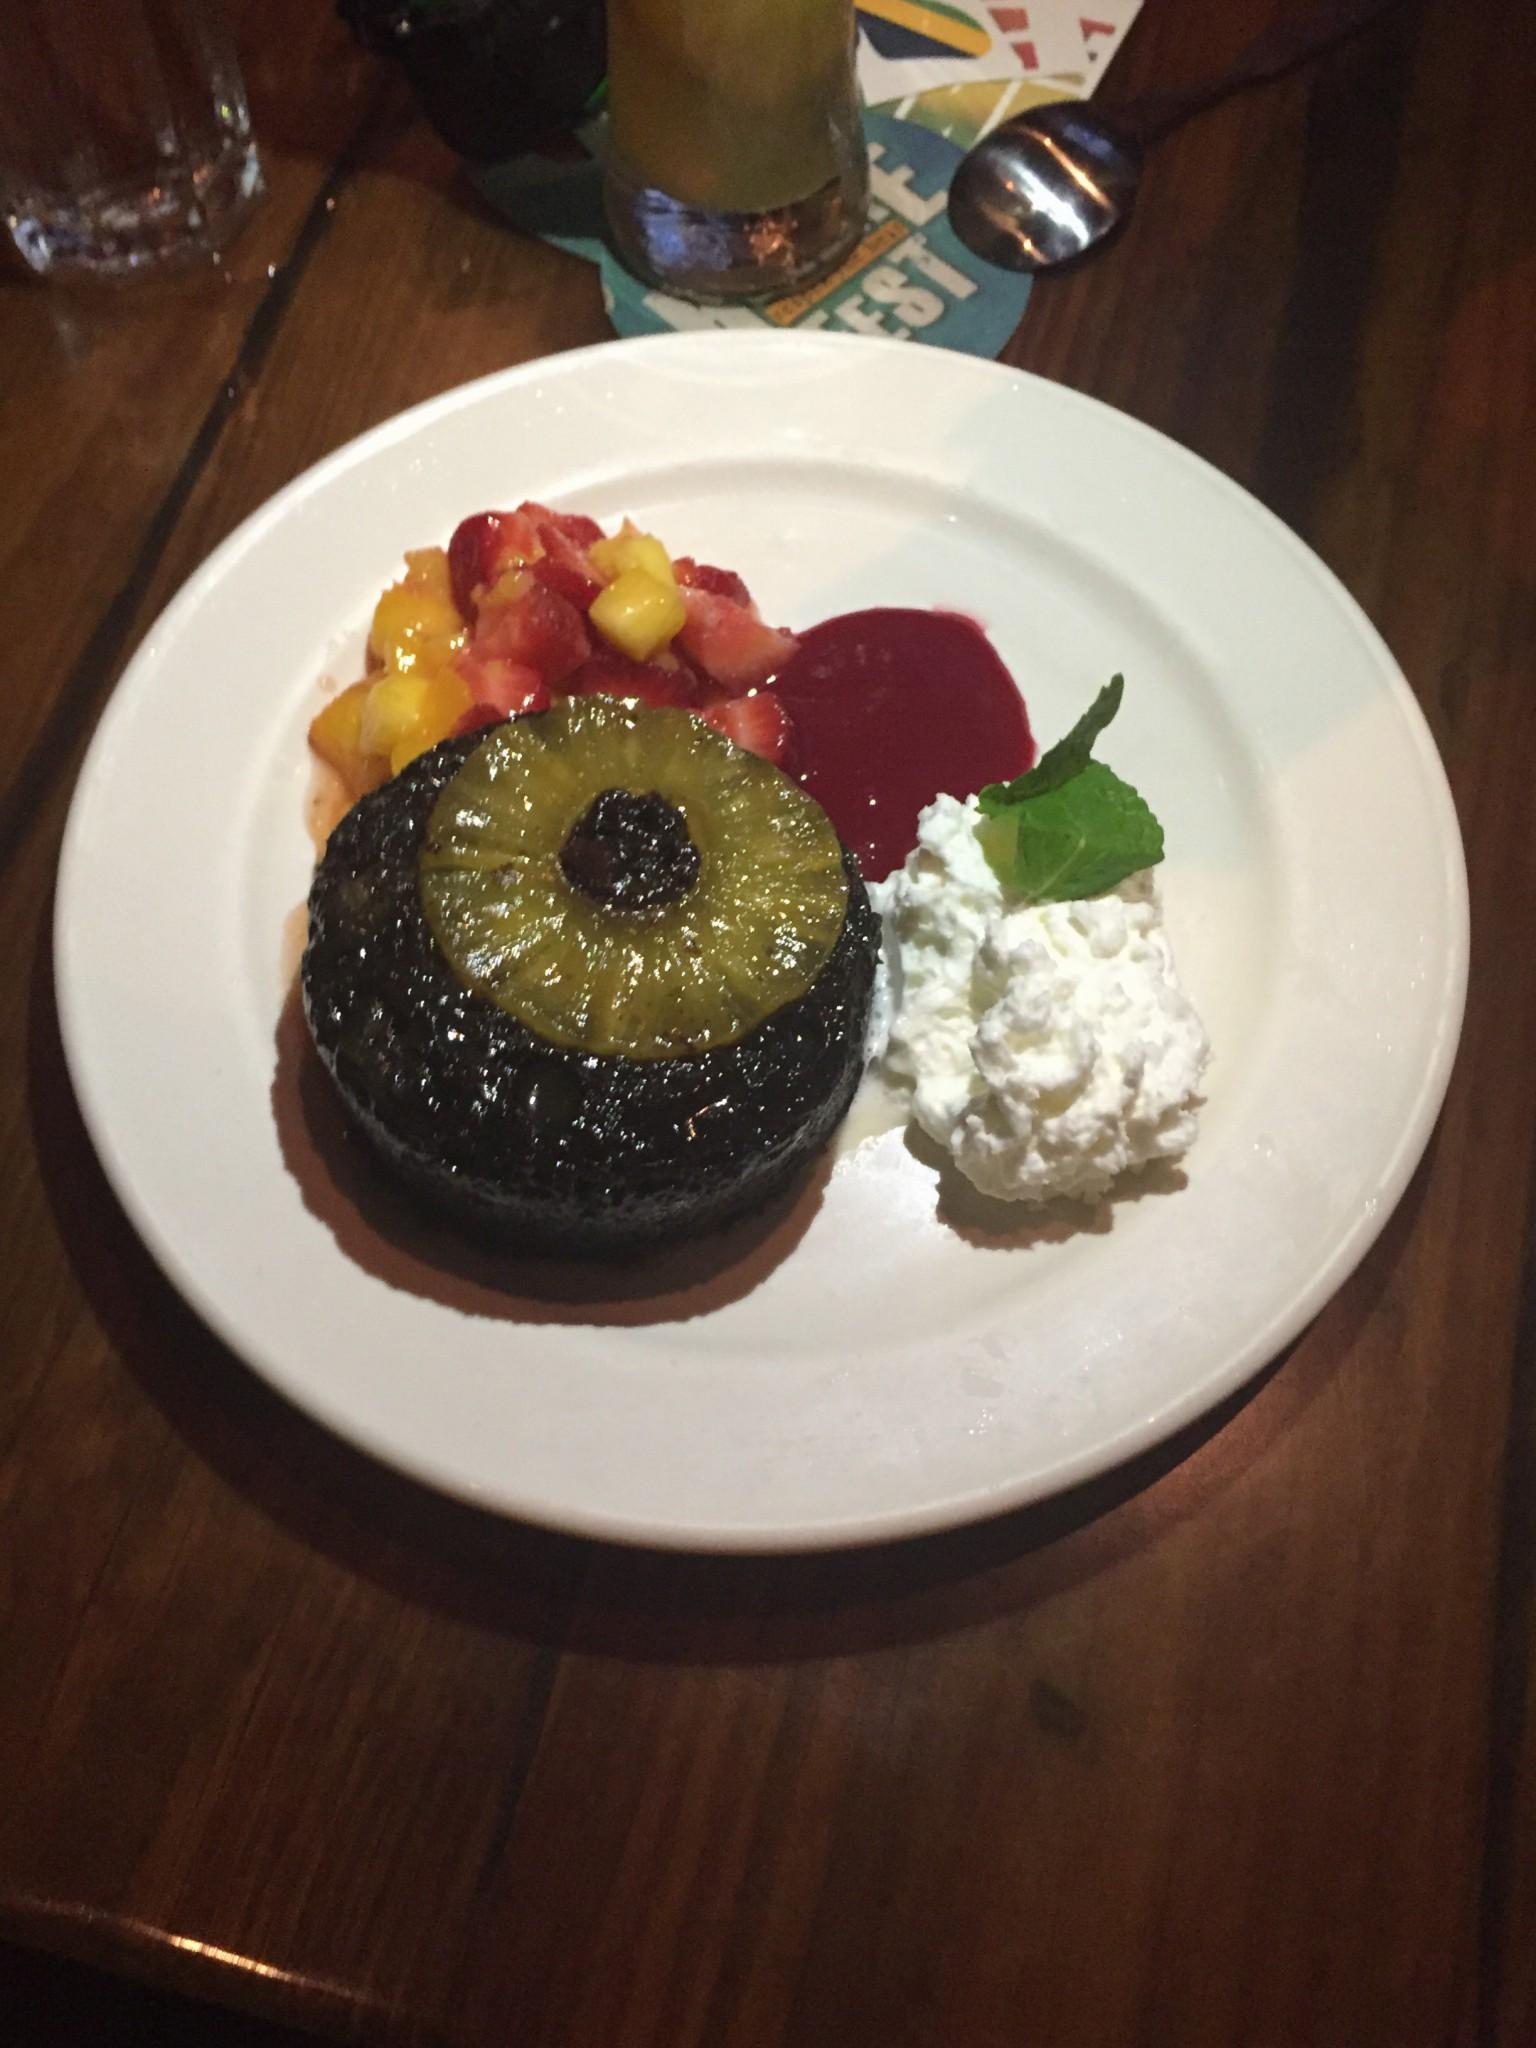 Bahama Breeze – Warm Chocolate Pineapple Upside Down Cake